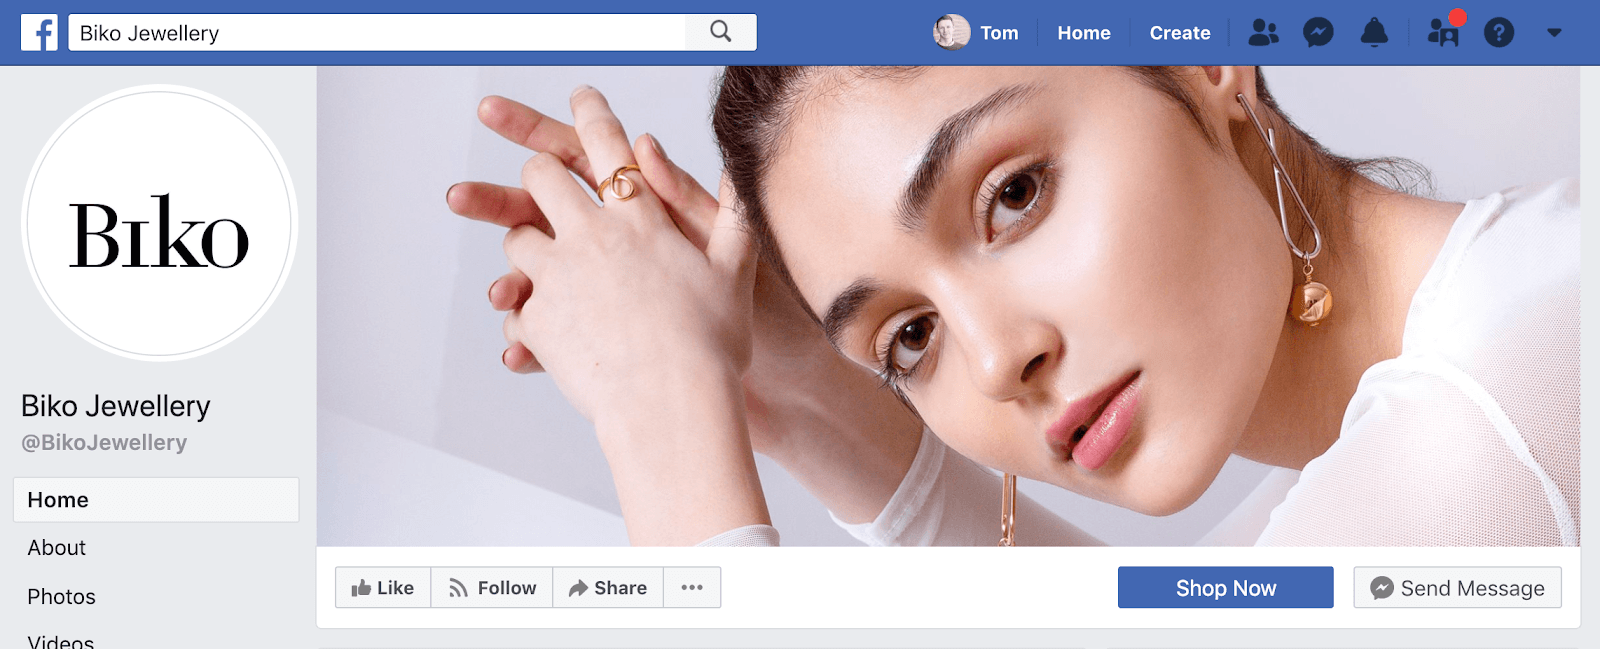 Biko Facebook Page